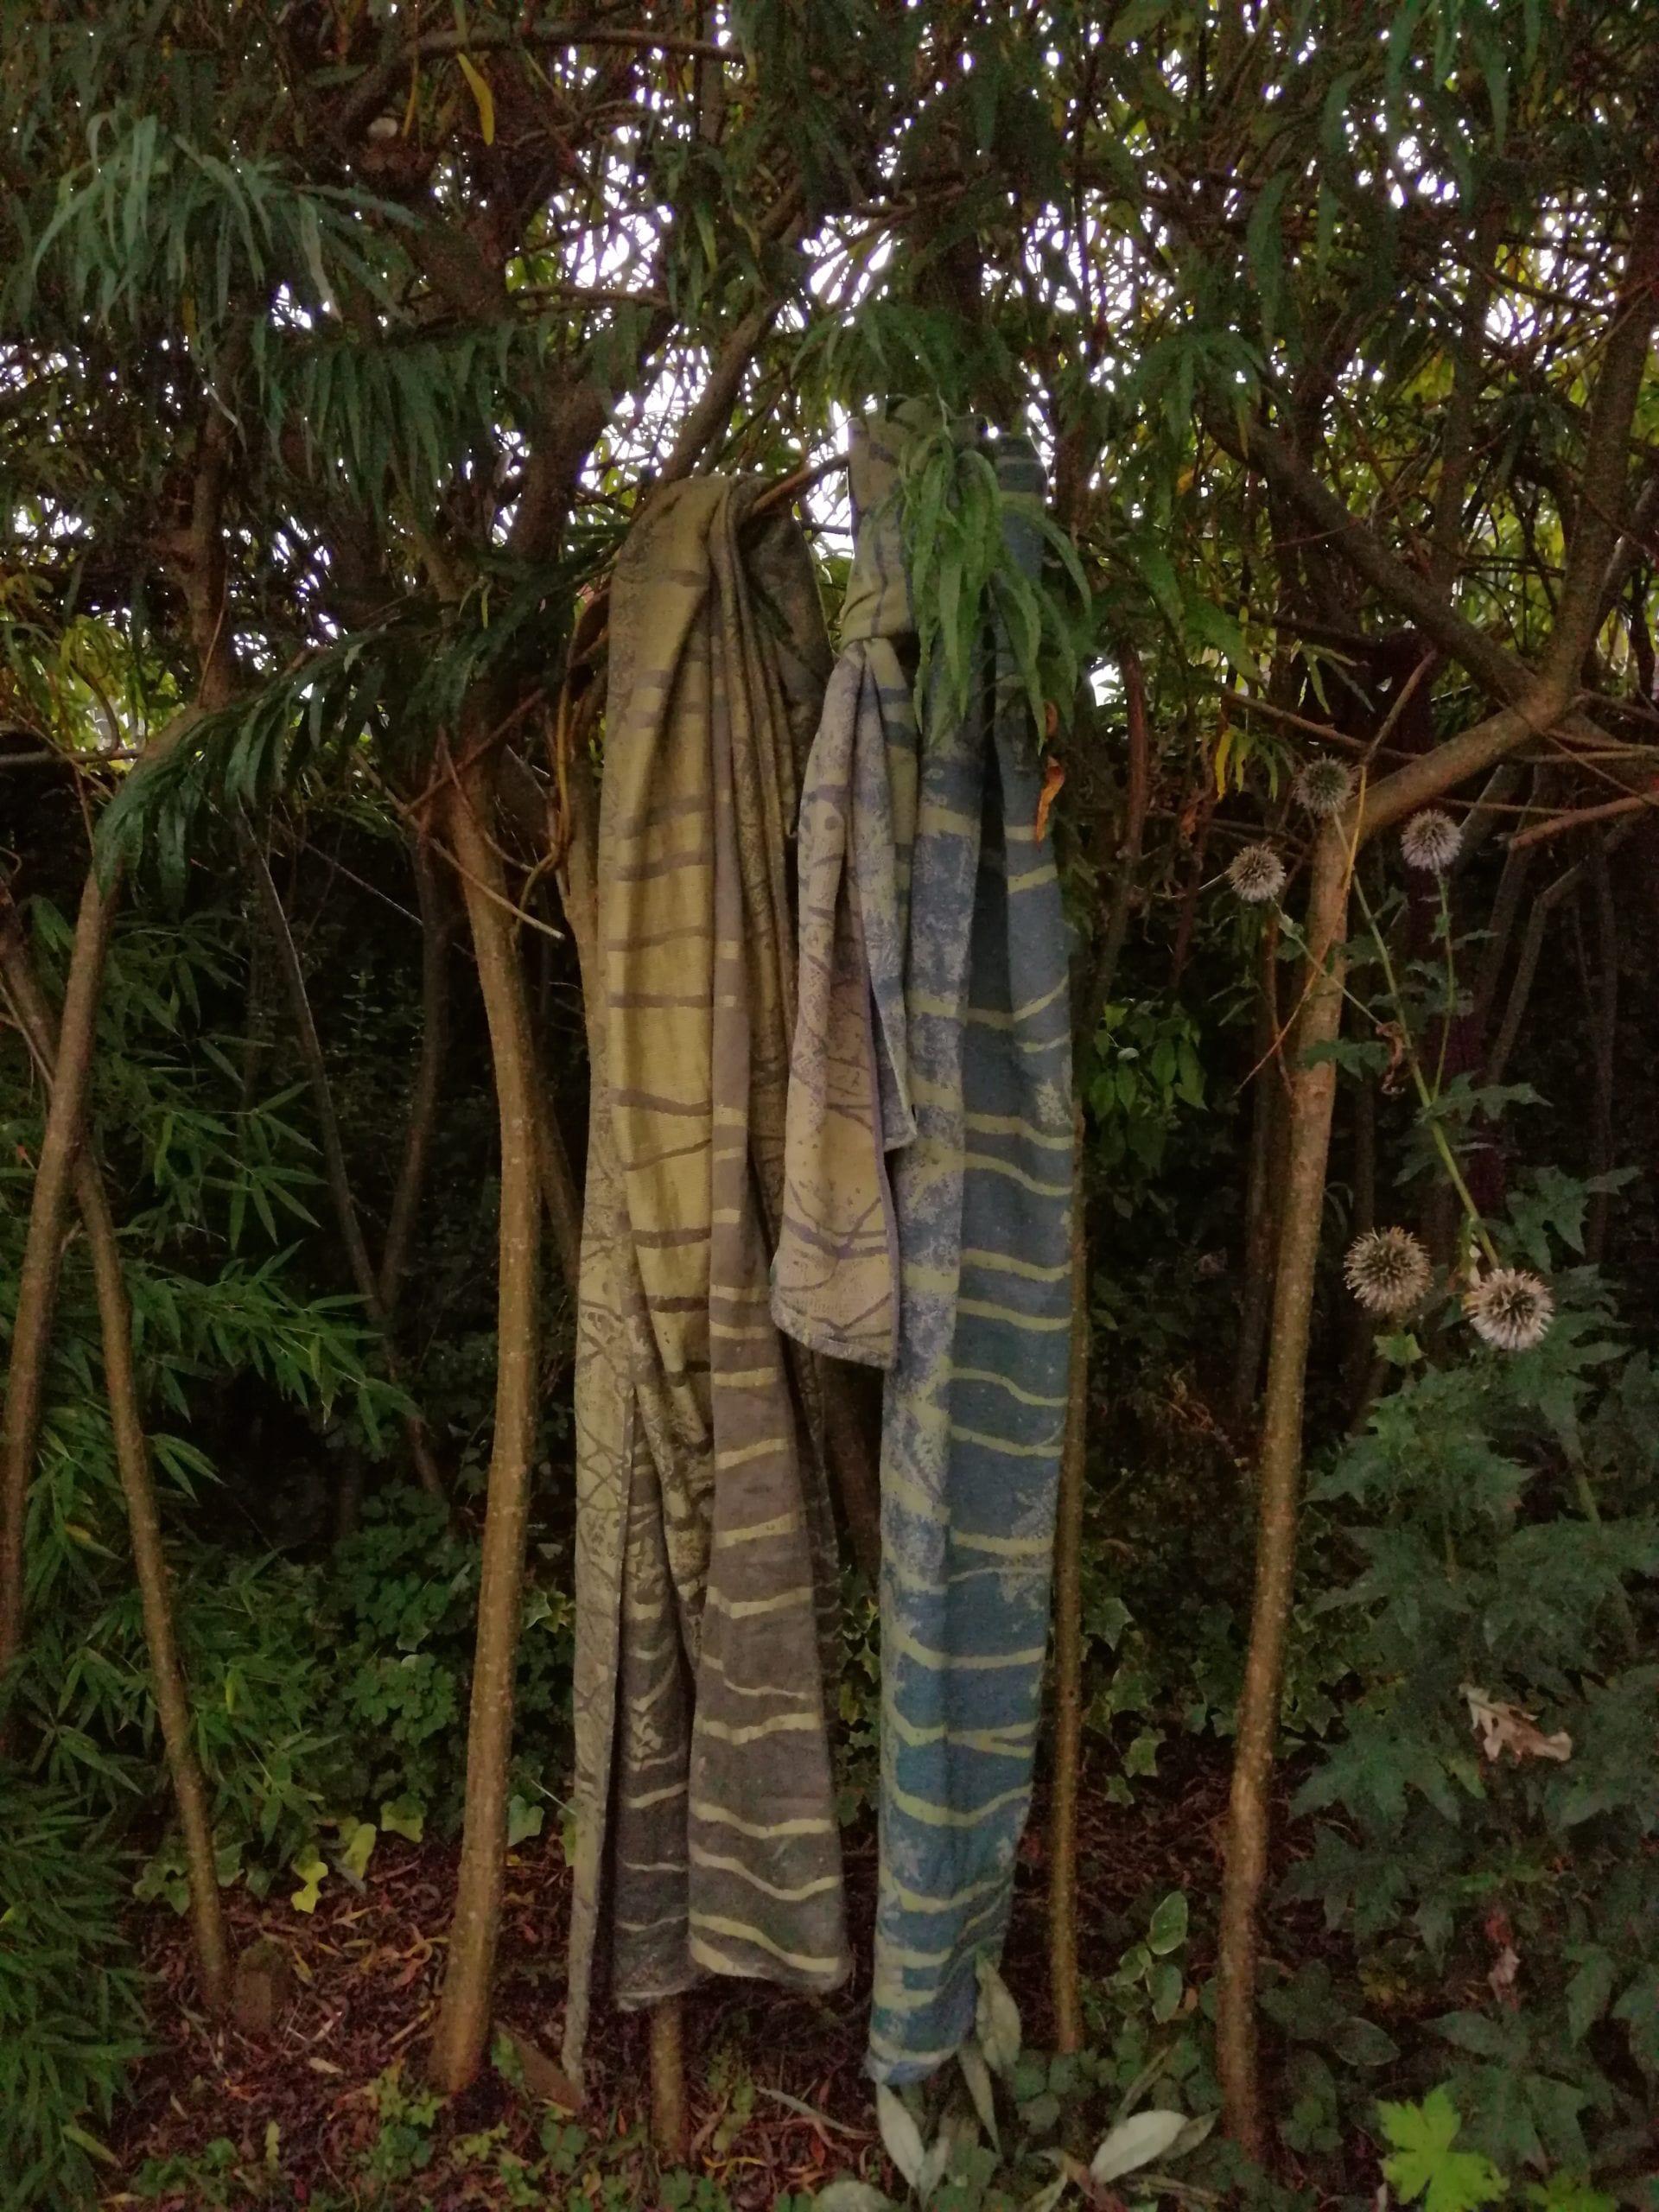 comparing 2 birch trees wraps